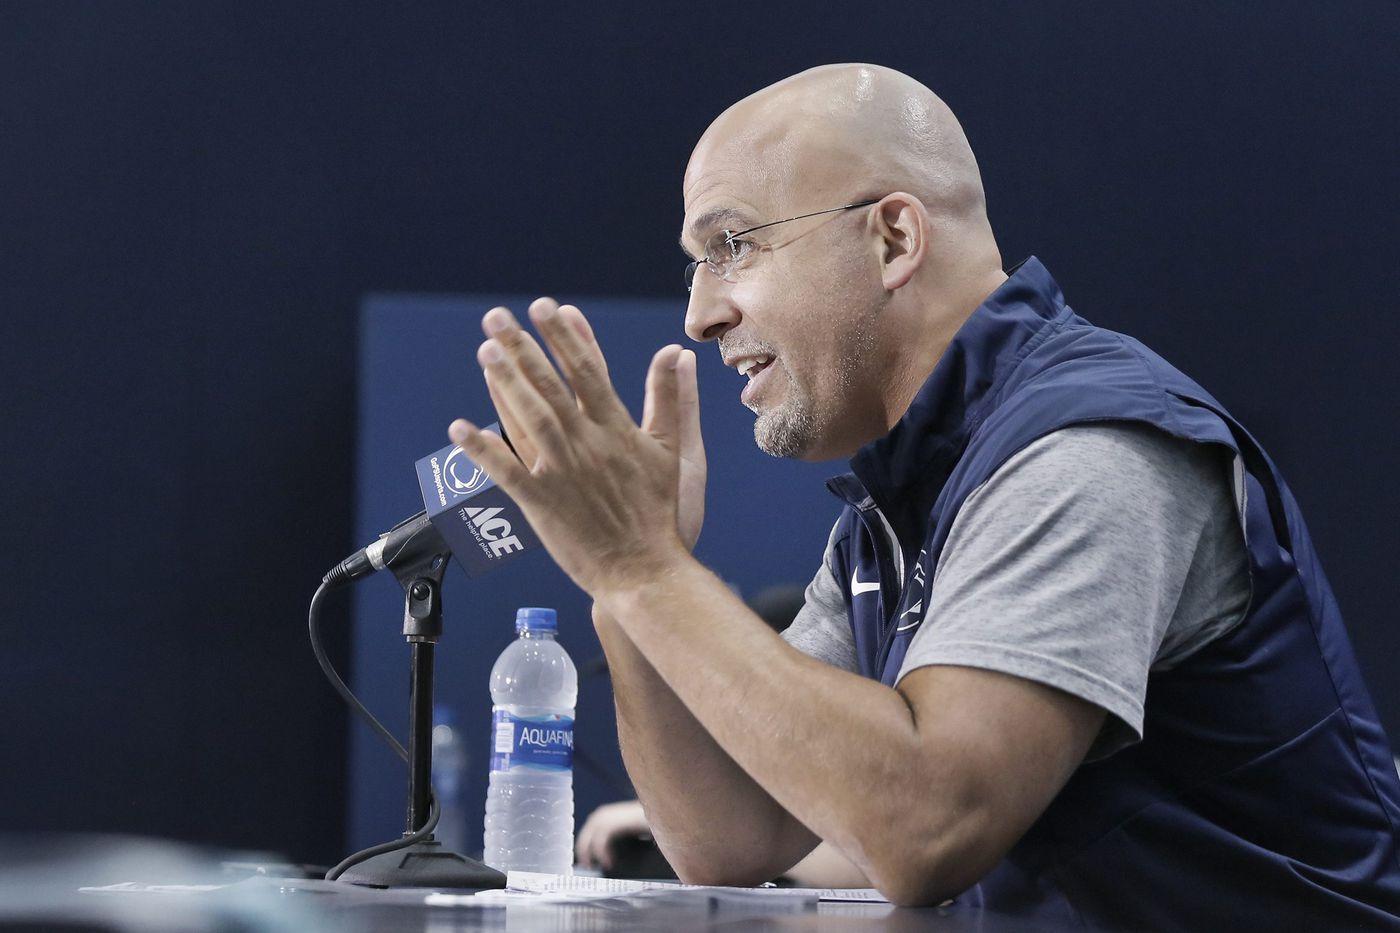 Injury ends career of Penn State quarterback Jake Zembiec